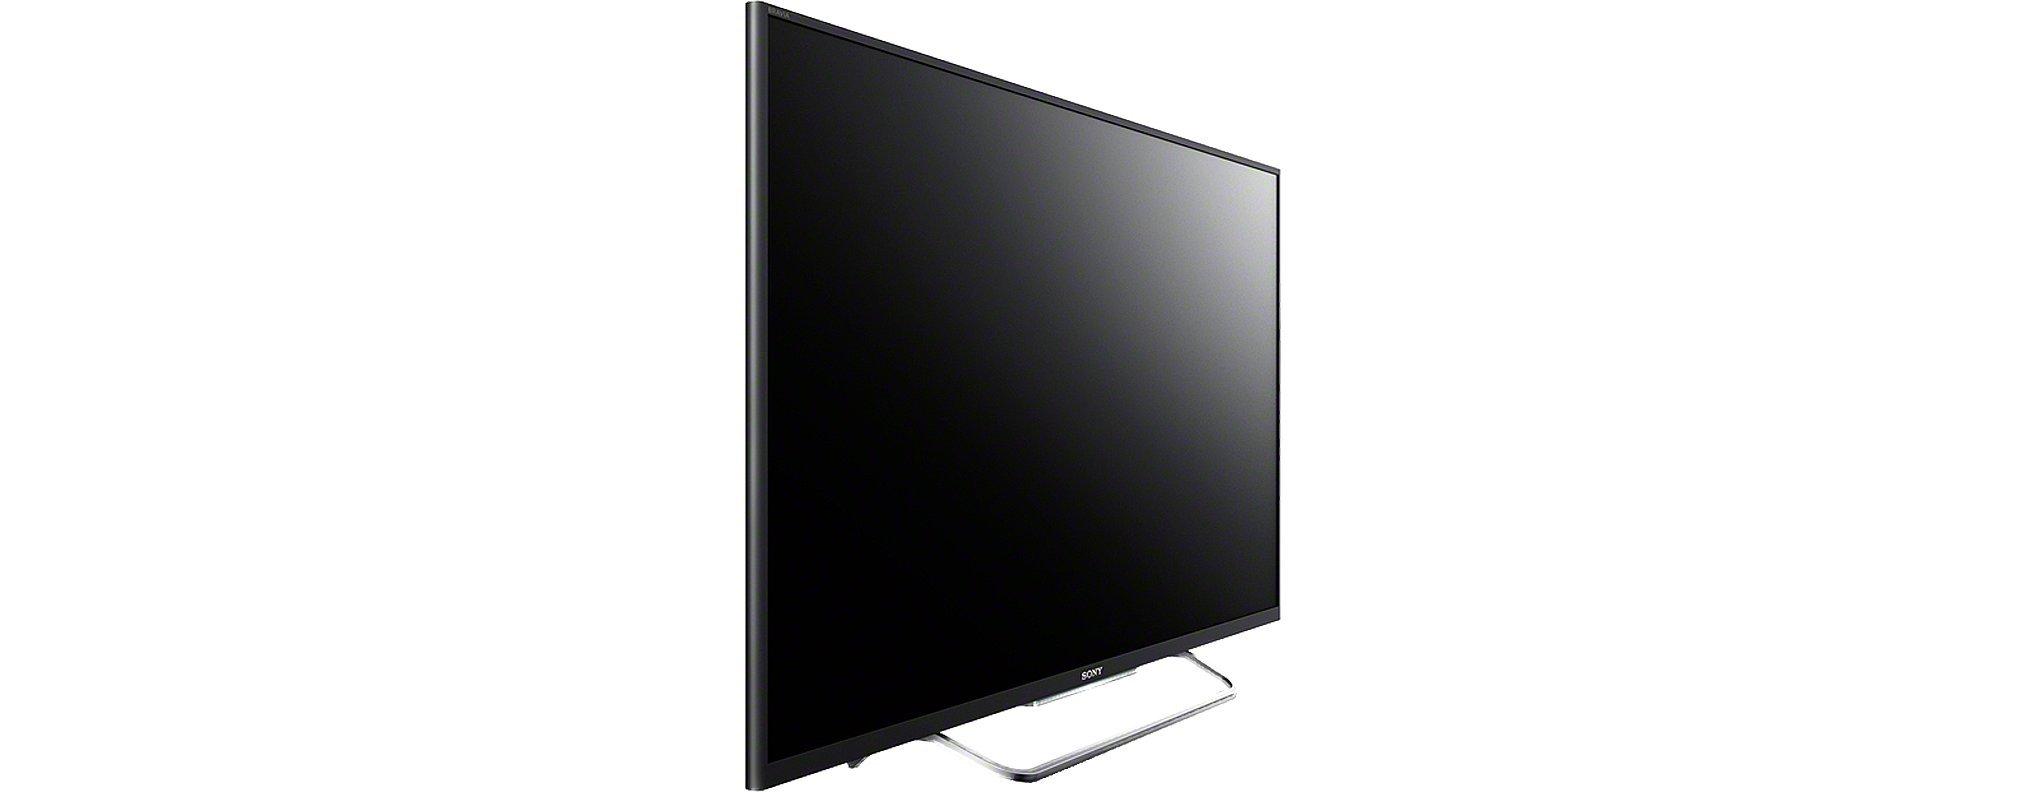 Sony KDL32W705BBAEP - Televisor LED de 31.5